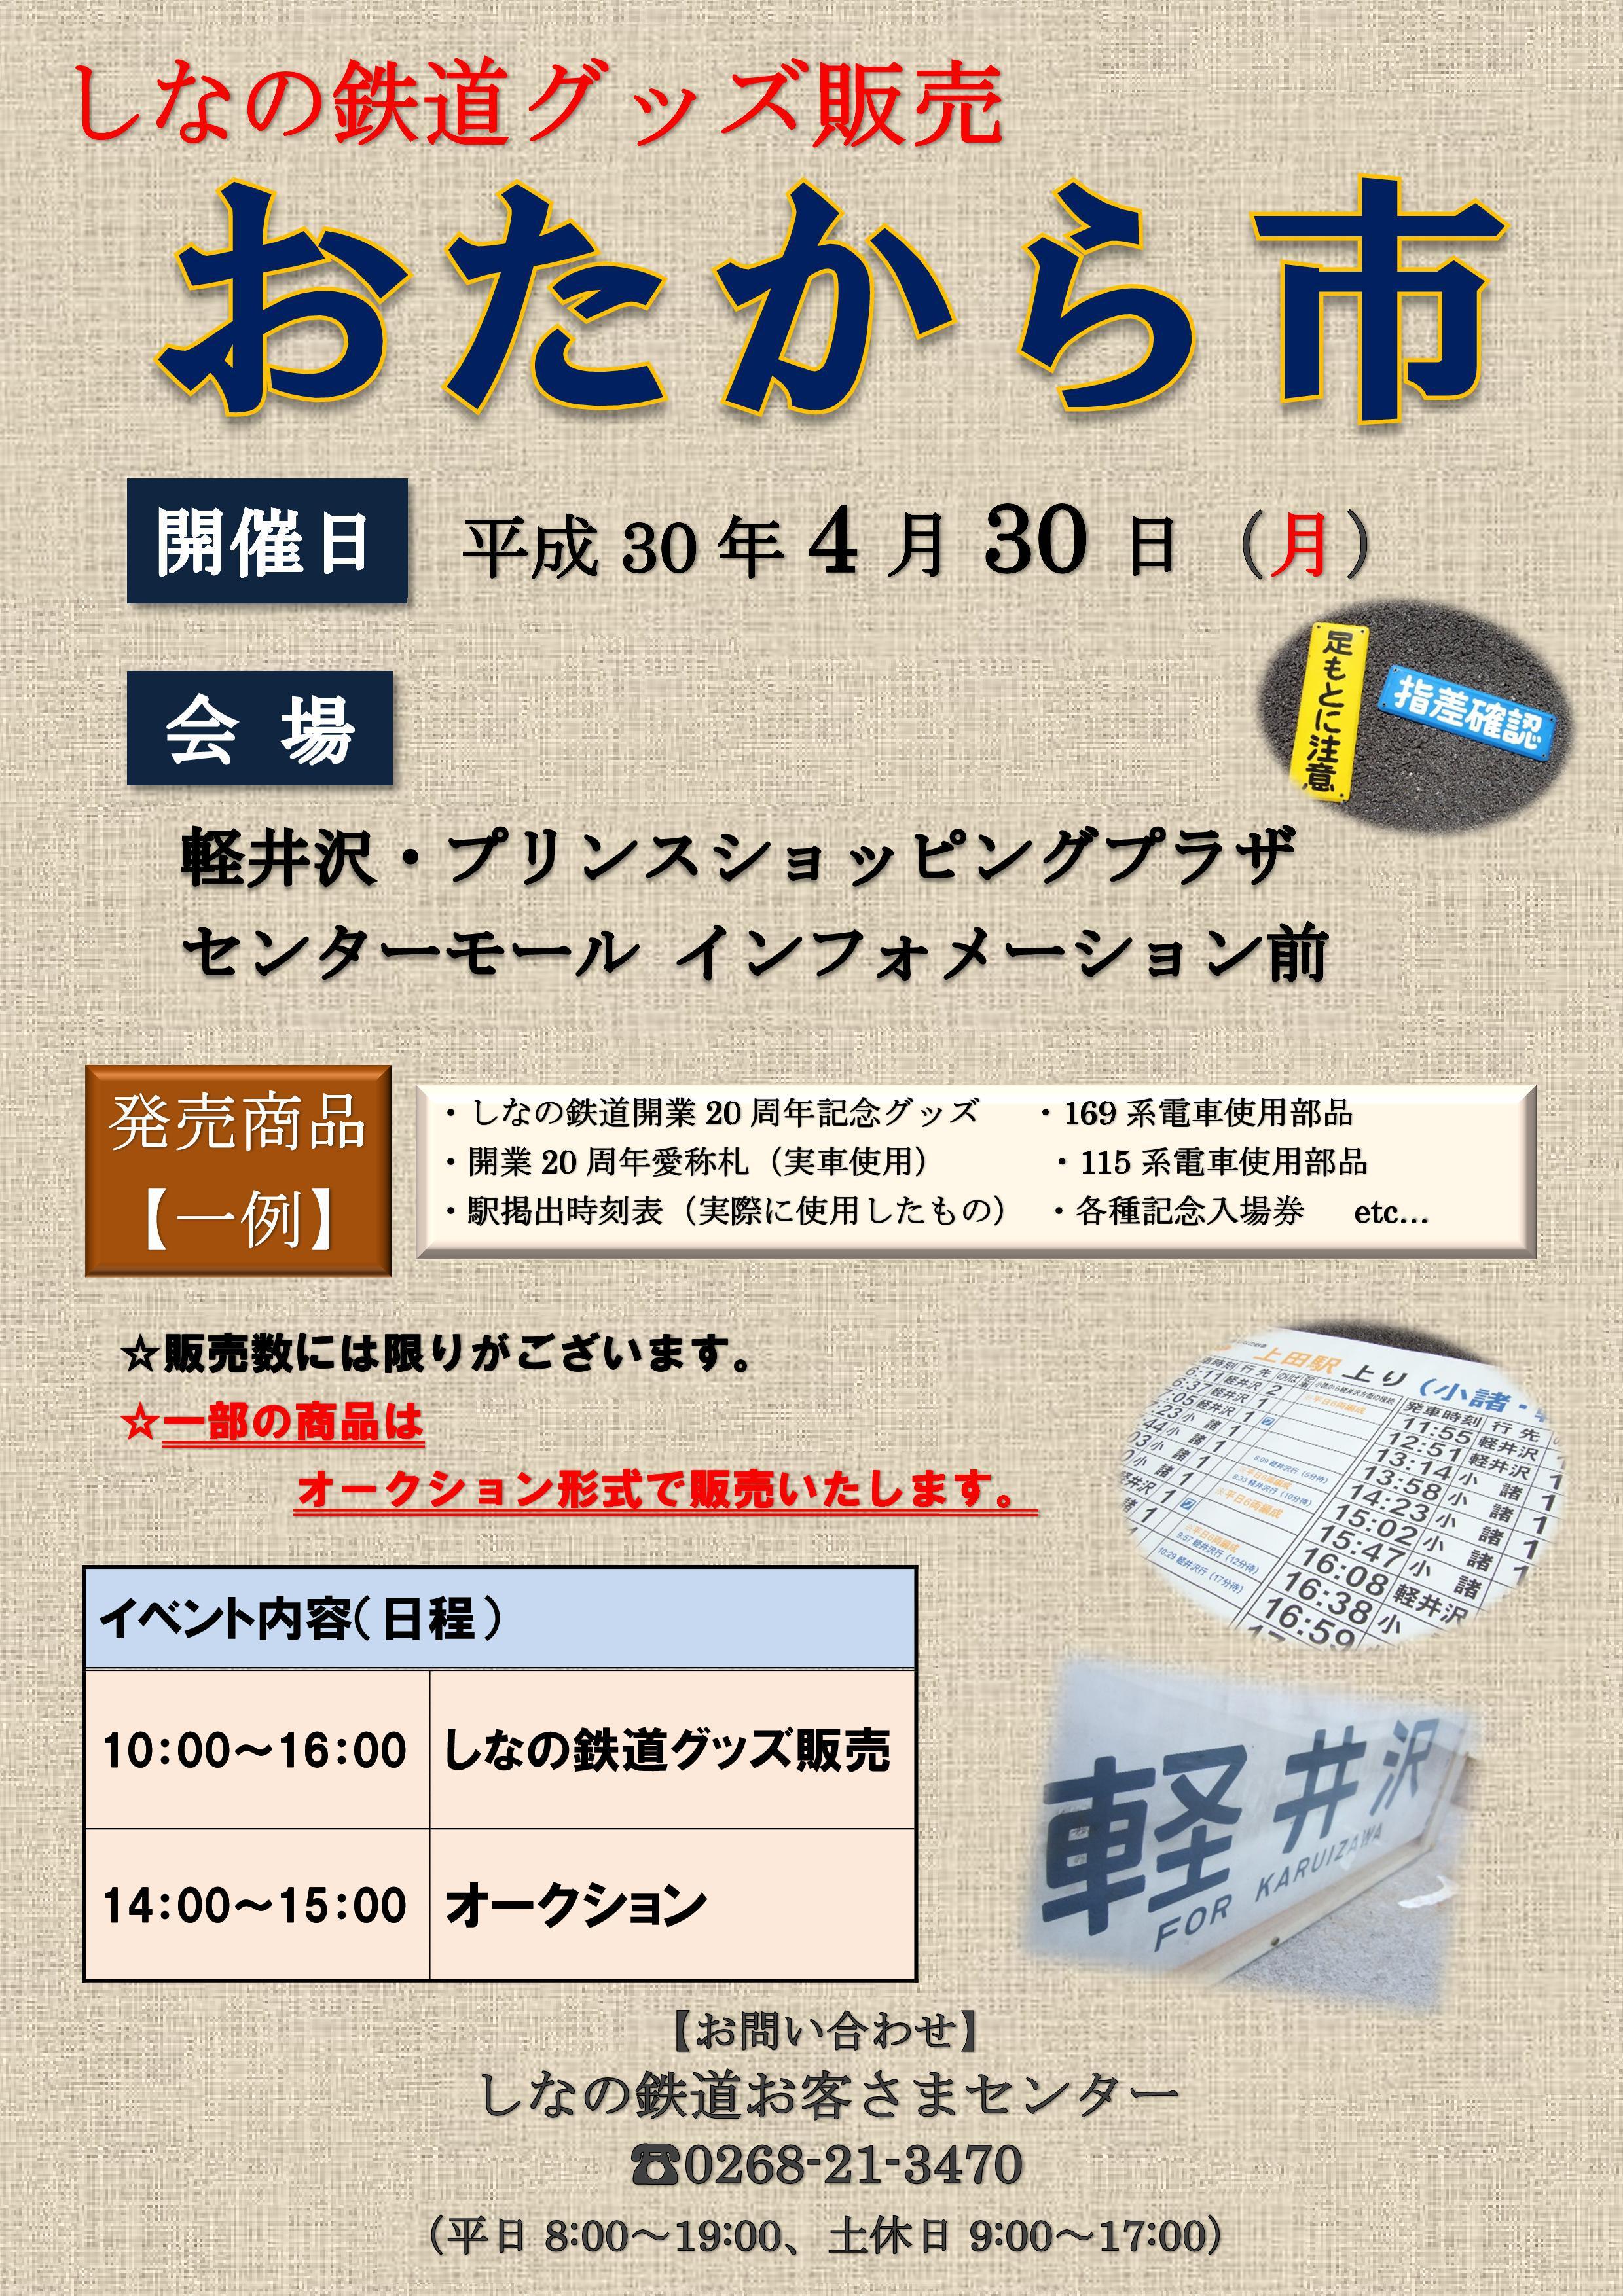 20180427_karuizawa_event11.jpg